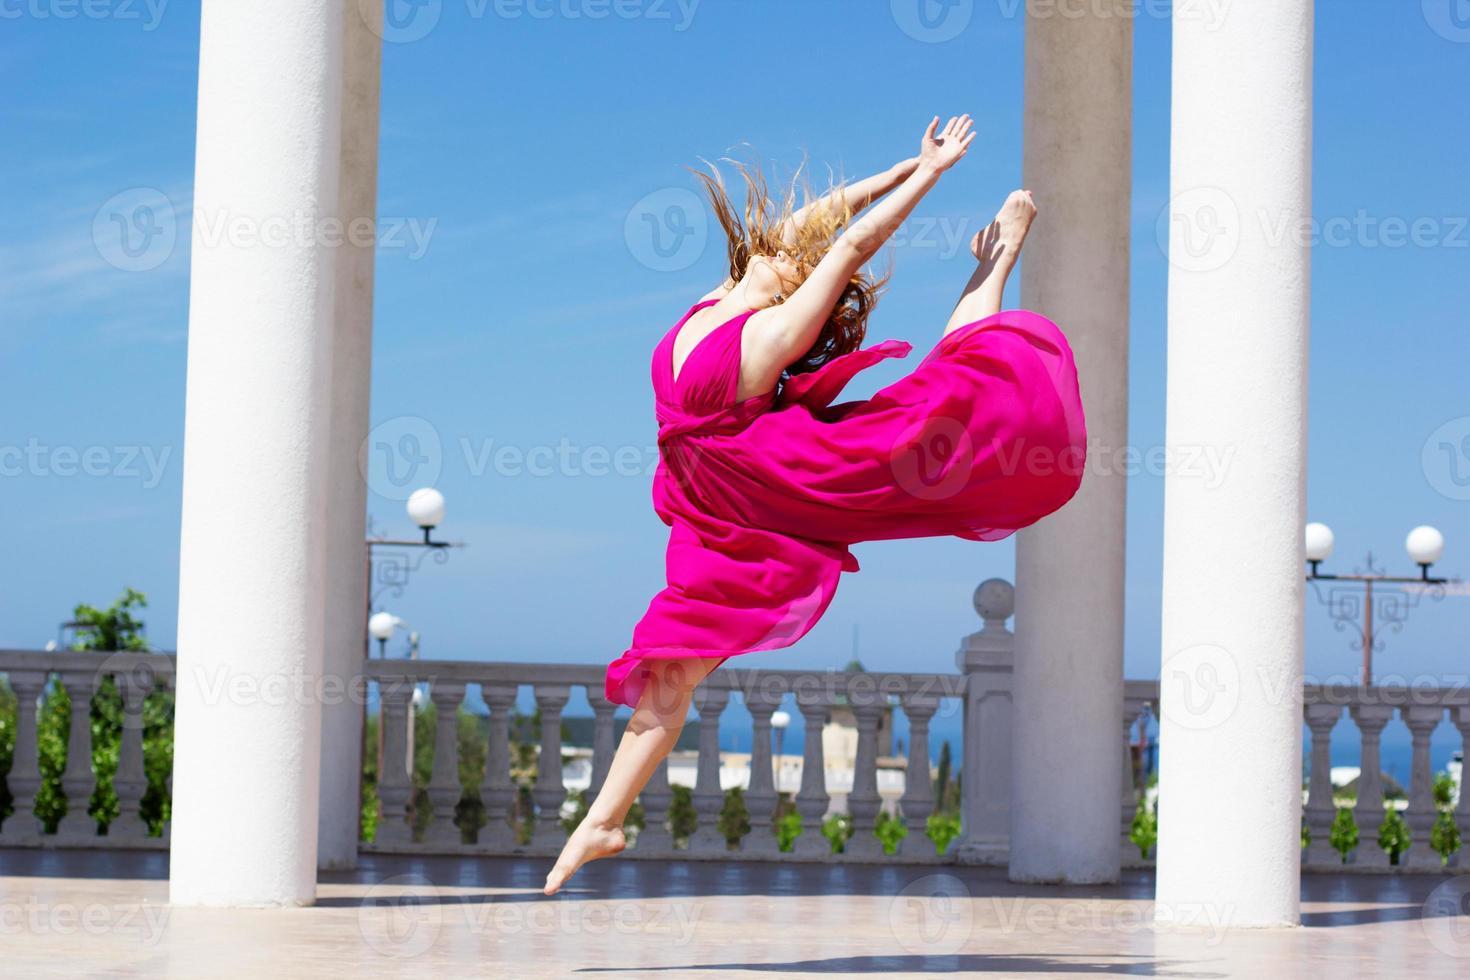 joven hermosa chica haciendo gimnasia al aire libre foto